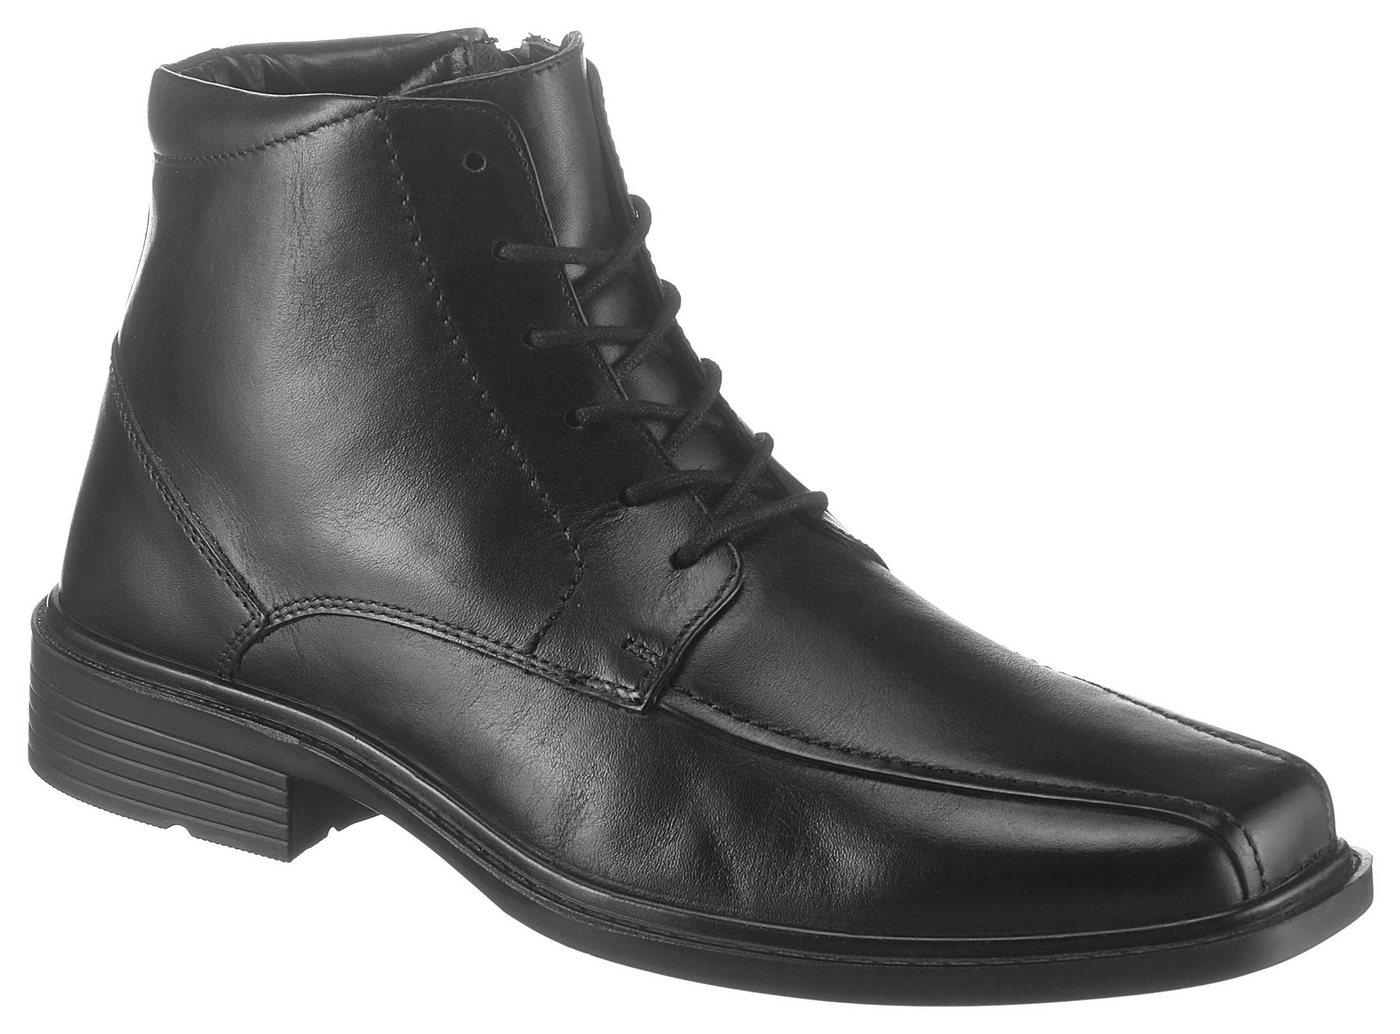 Herren PETROLIO Schnürstiefelette in klassischem Design schwarz | 08904258912479